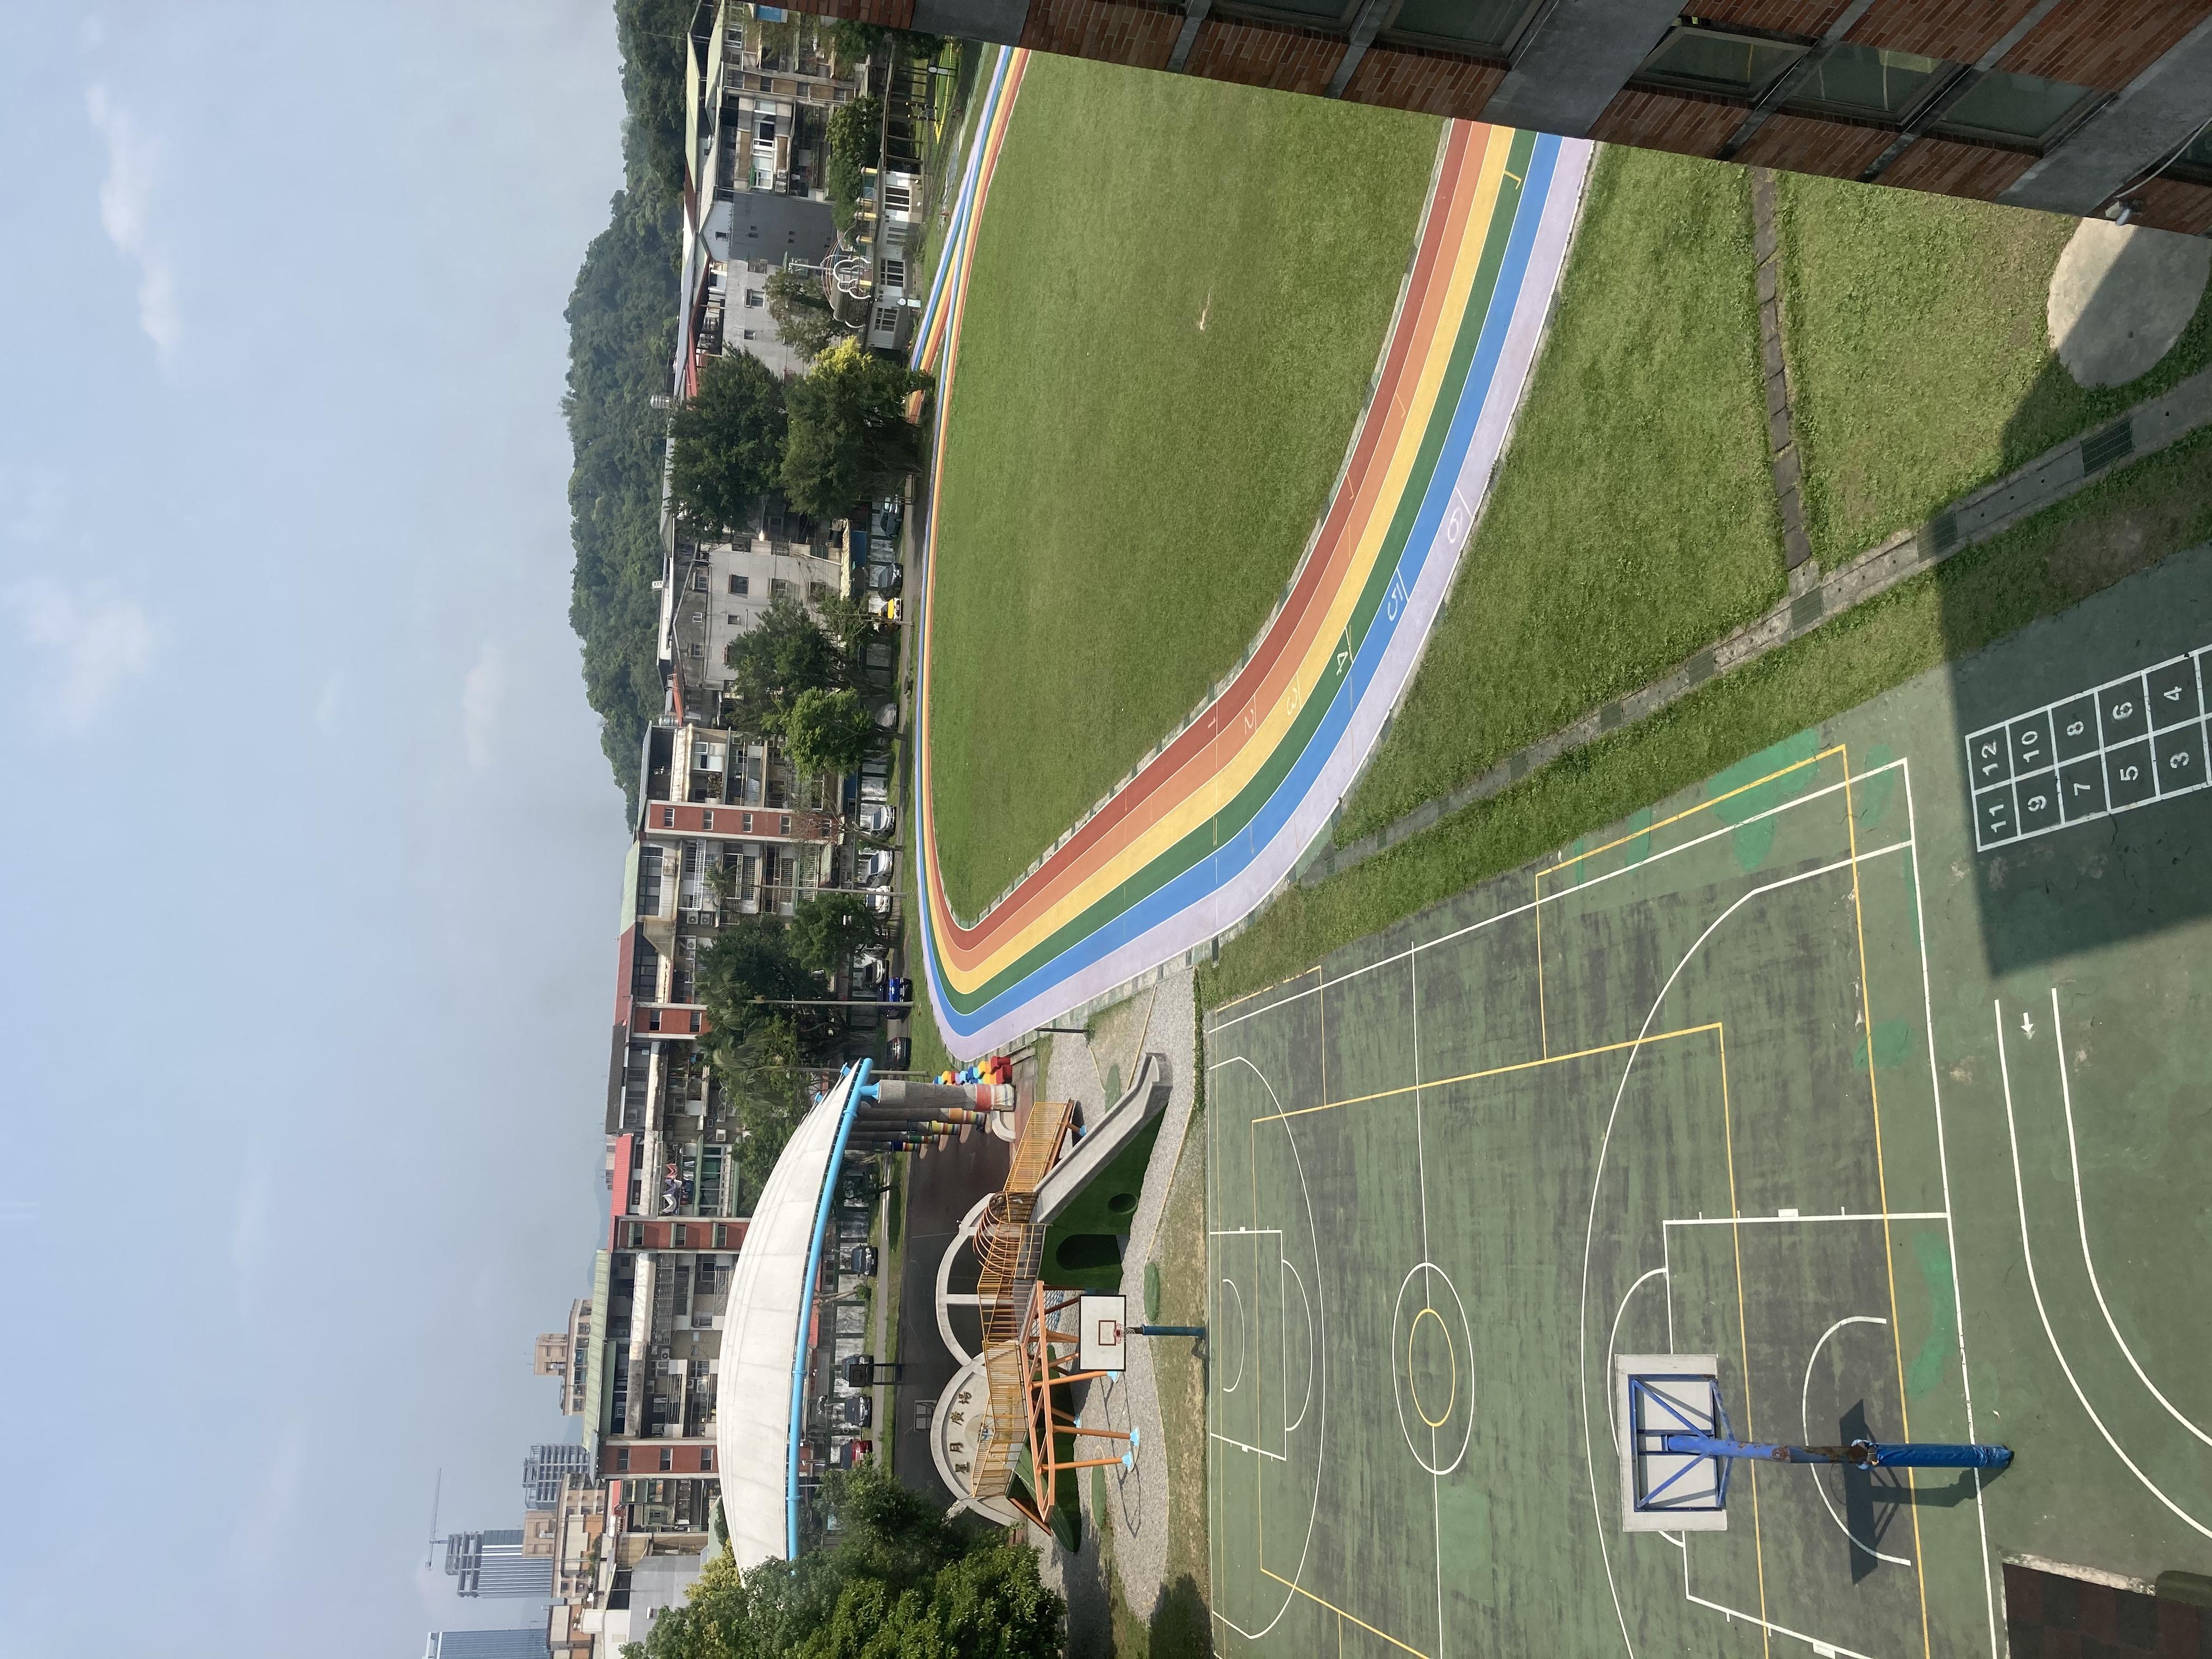 Teaching English and Living in Taiwan Jobs Available 教學工作, YG Expert 高薪! 兼職! 誠徵公立小學課後英語班外籍教師! image